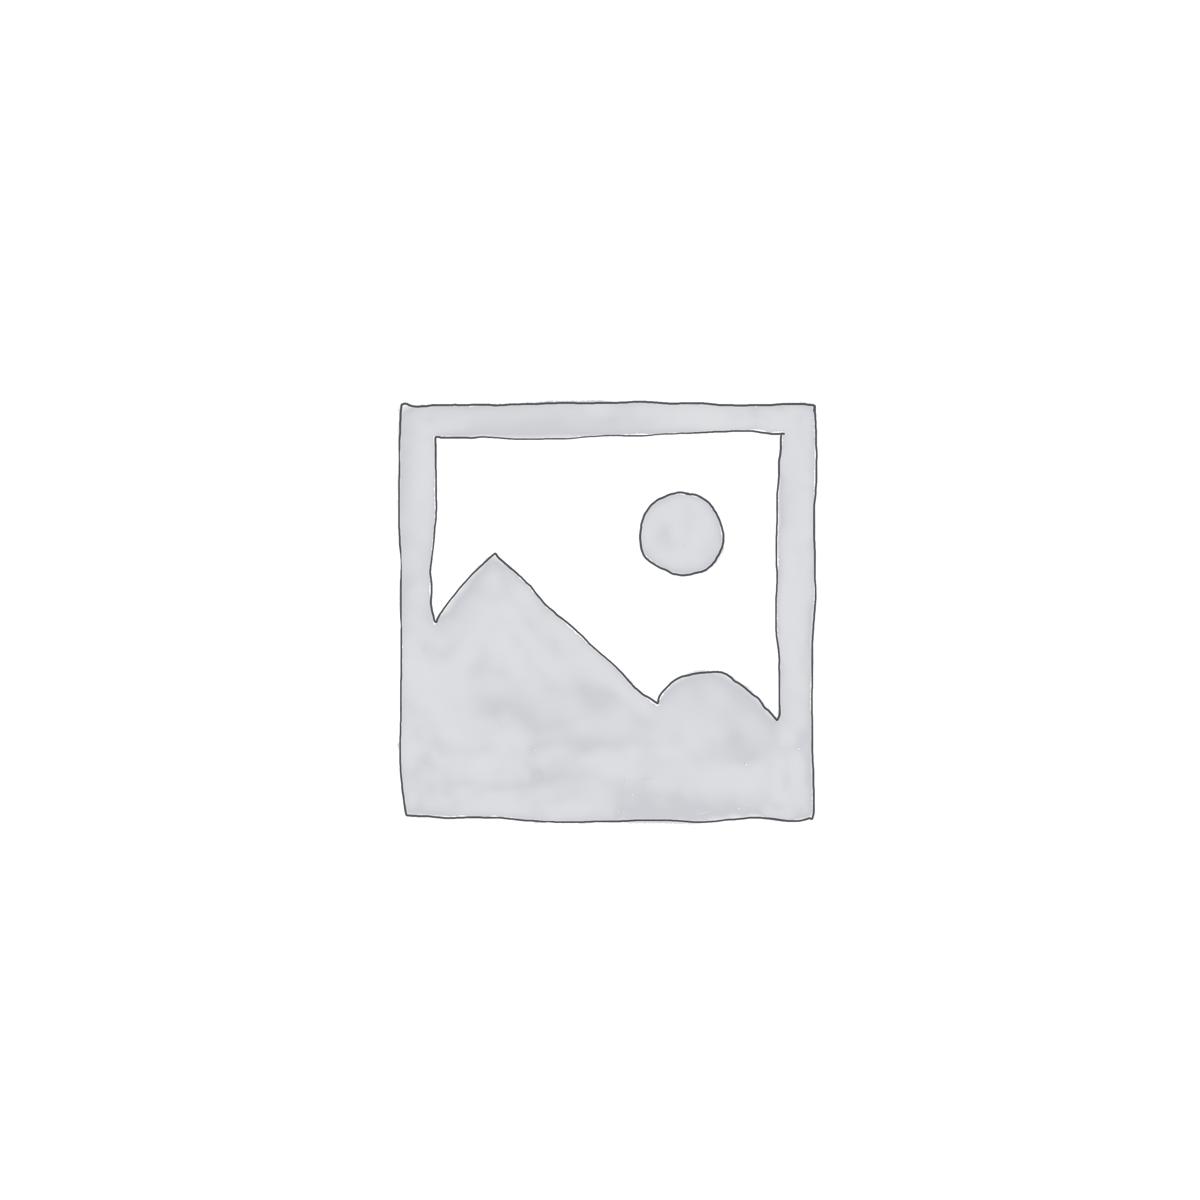 Les pakketten Micro:bit